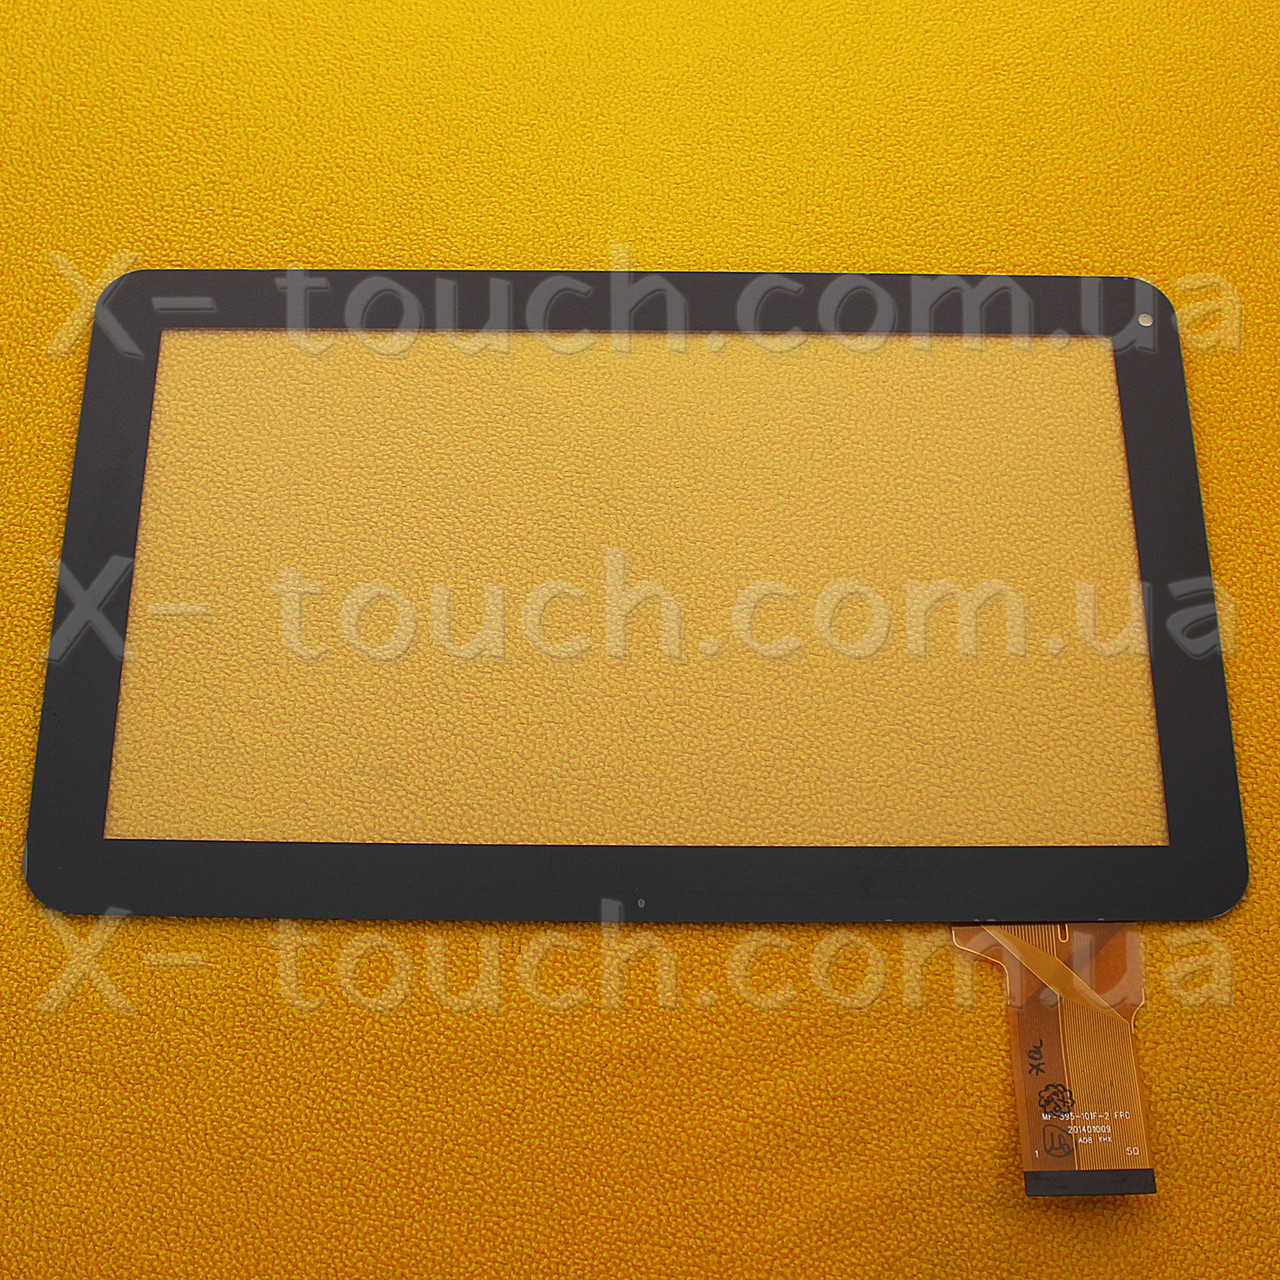 Тачскрин, сенсор  AP DH-1007A4-PG- FPC033-V2.0  для планшета